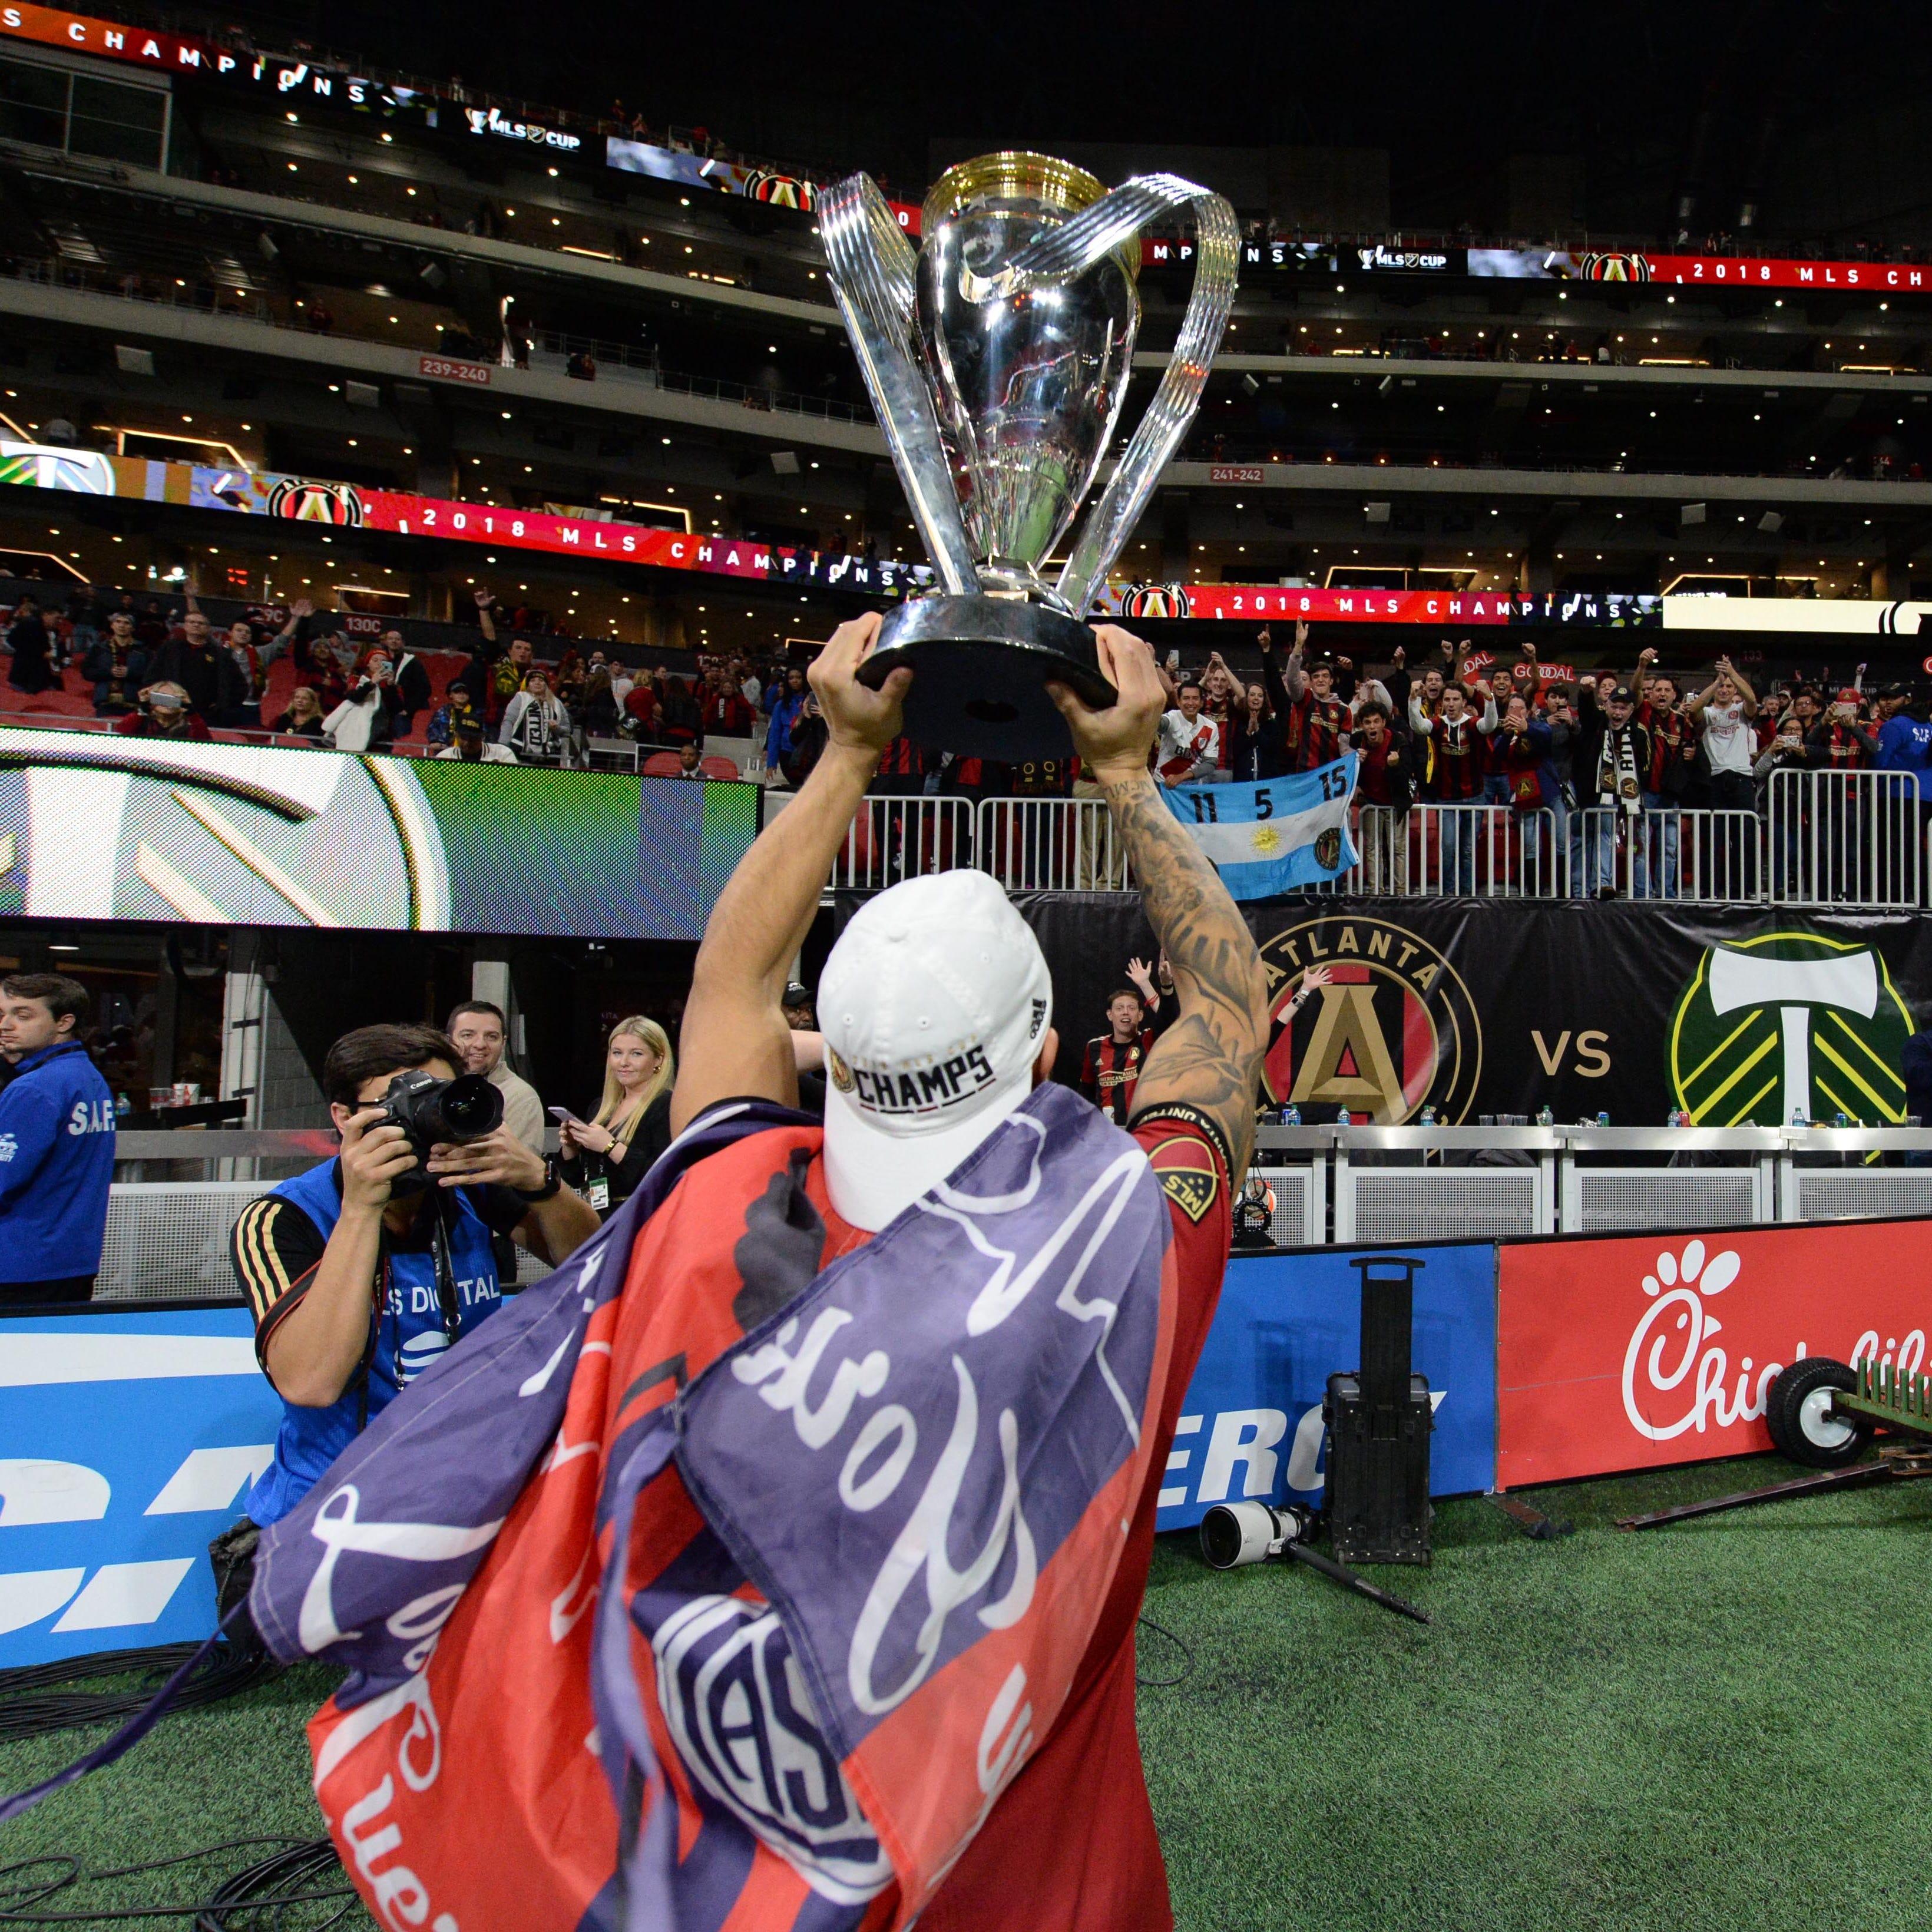 MLS overhauls playoff format ahead of 2019, FC Cincinnati's debut season